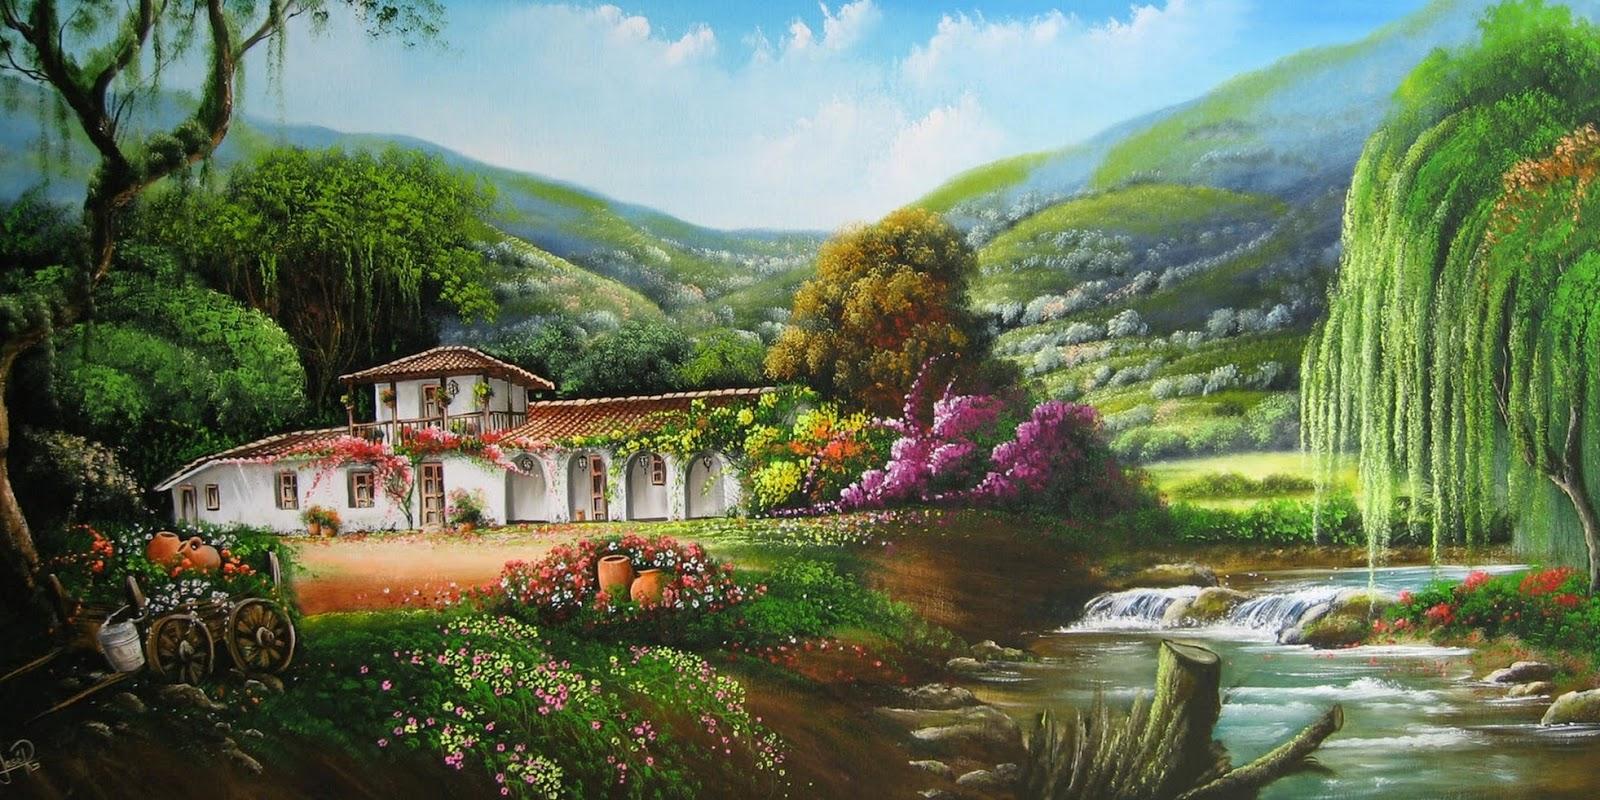 Pintura moderna y fotograf a art stica paisajes - Los cuadros mas bonitos ...